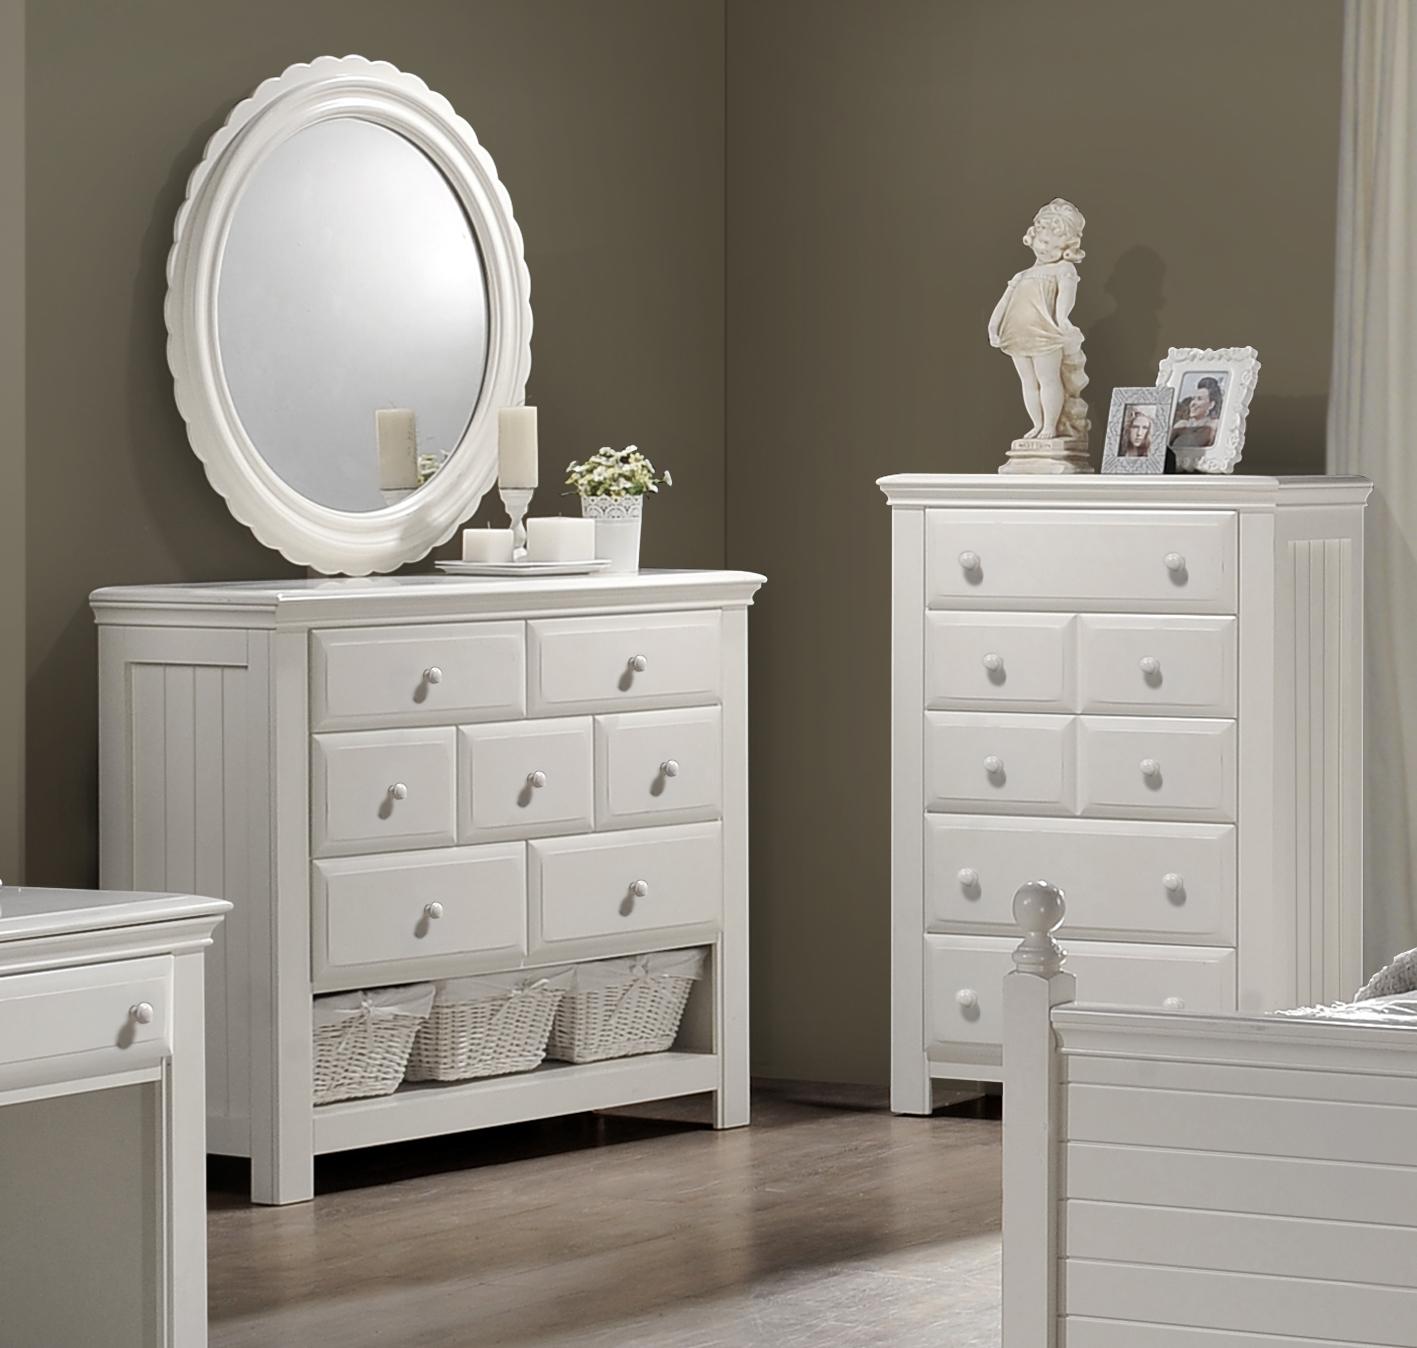 tops-495206 SONKEY- chest dresser mirror low rez.jpg